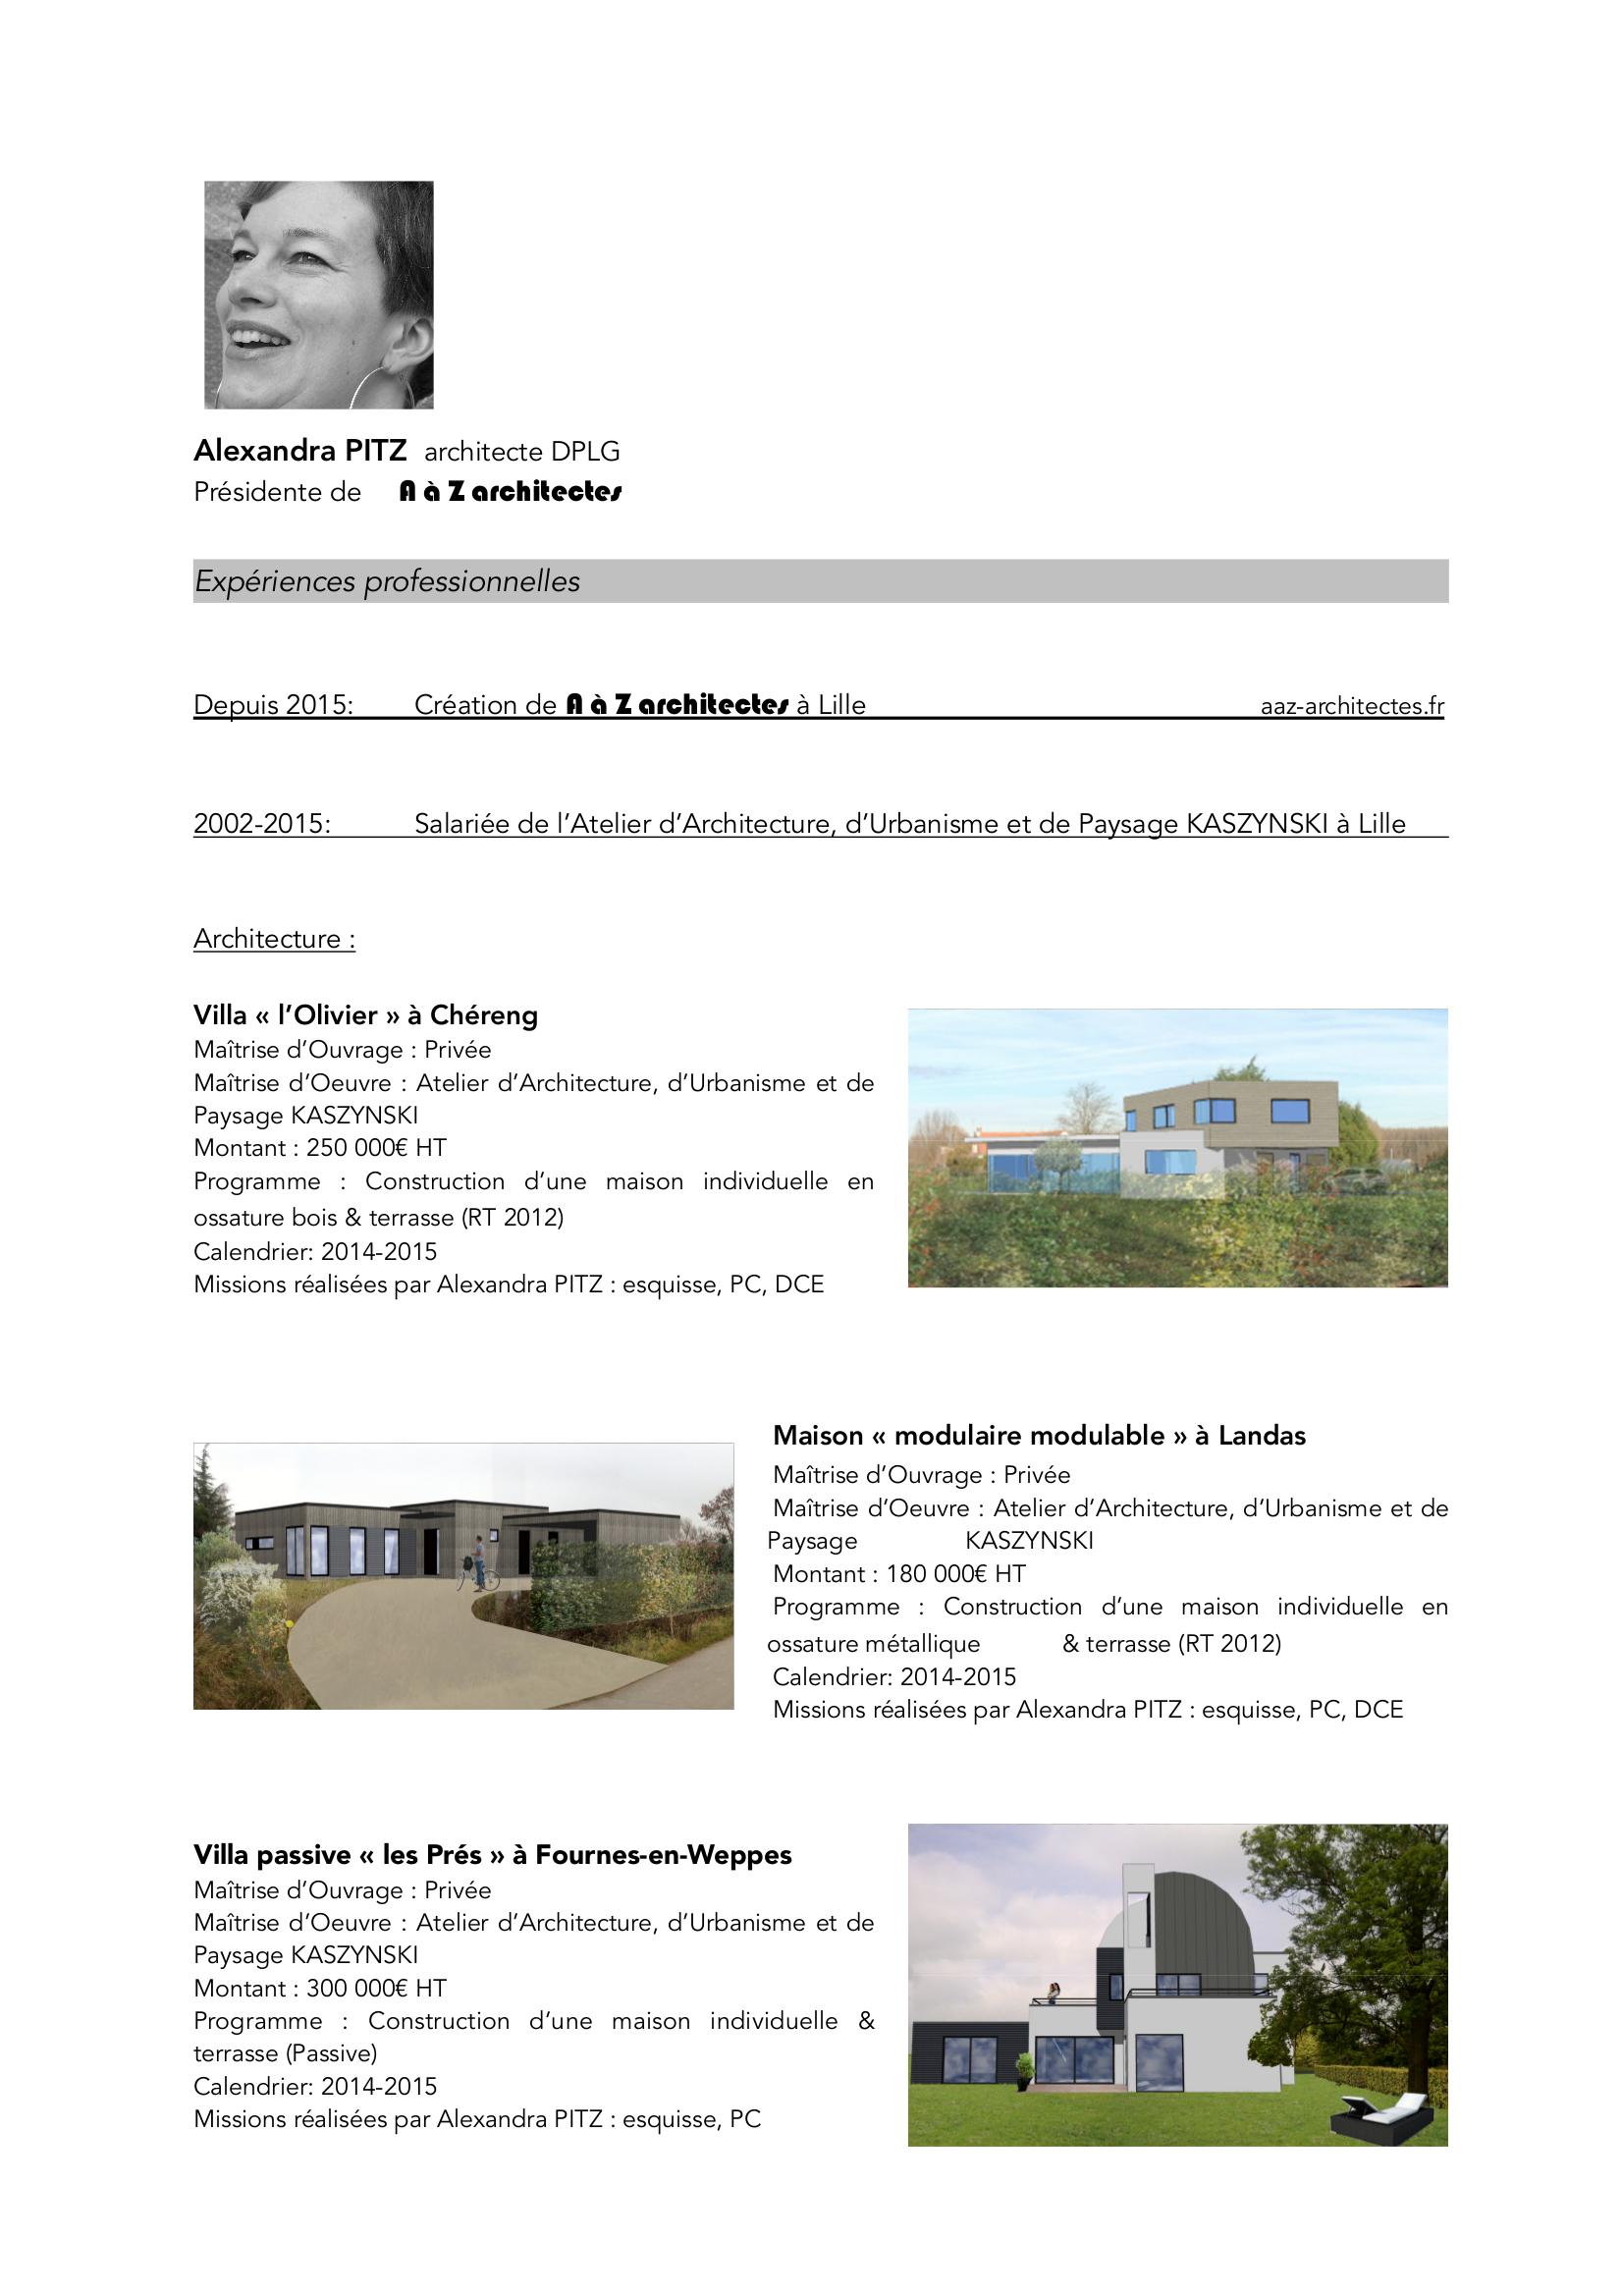 cv illustr u00e9  u2013 a  u00e0 z architectes